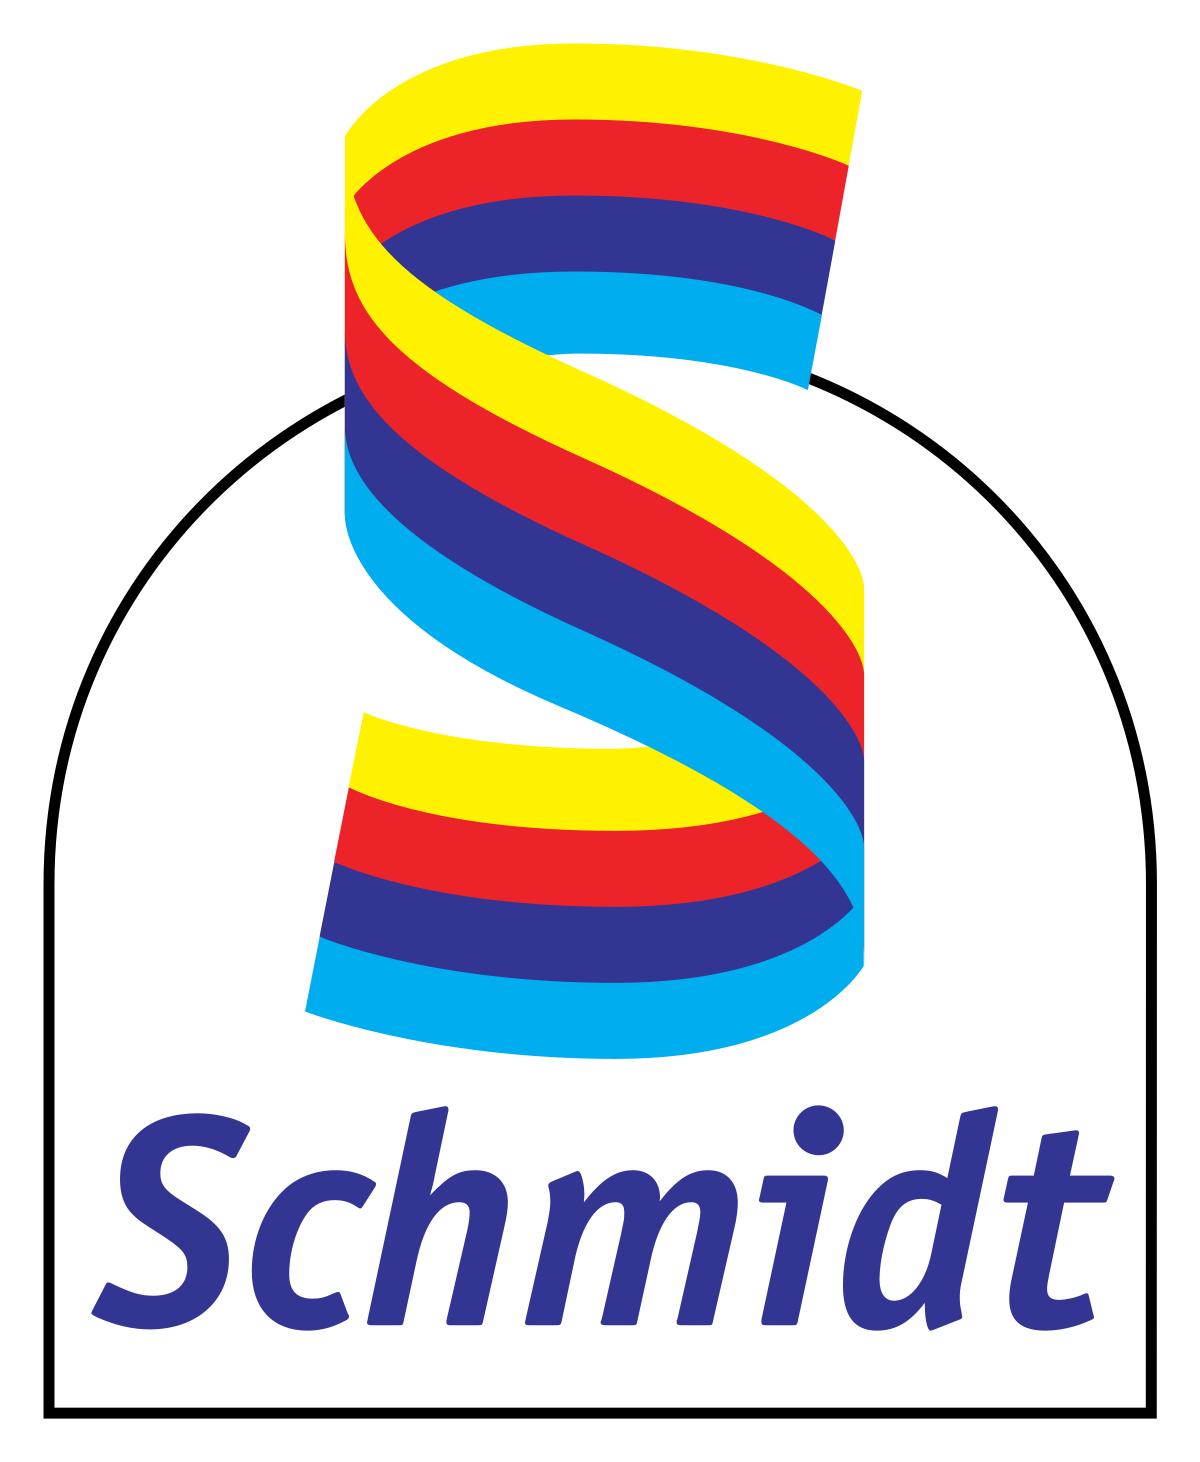 [Dagdeal] Korting op Schmidt Spiele spellen, knuffels, puzzels (overzicht) @ amazon.de